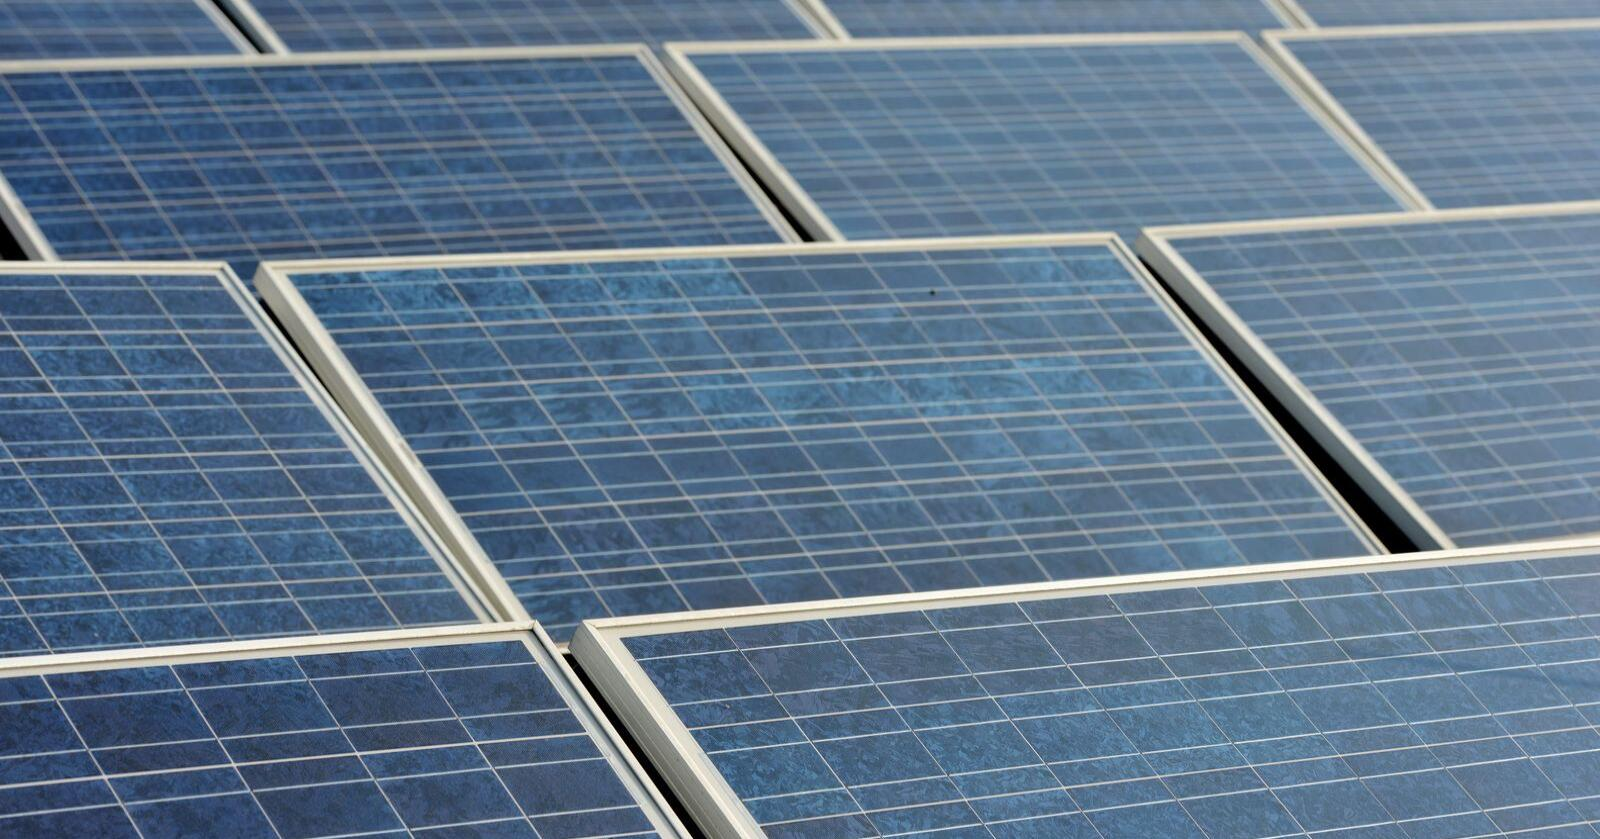 Det har vært en kraftig økning innen solceller i Norge. Illustrasjonsfoto: Frank May / NTB scanpix